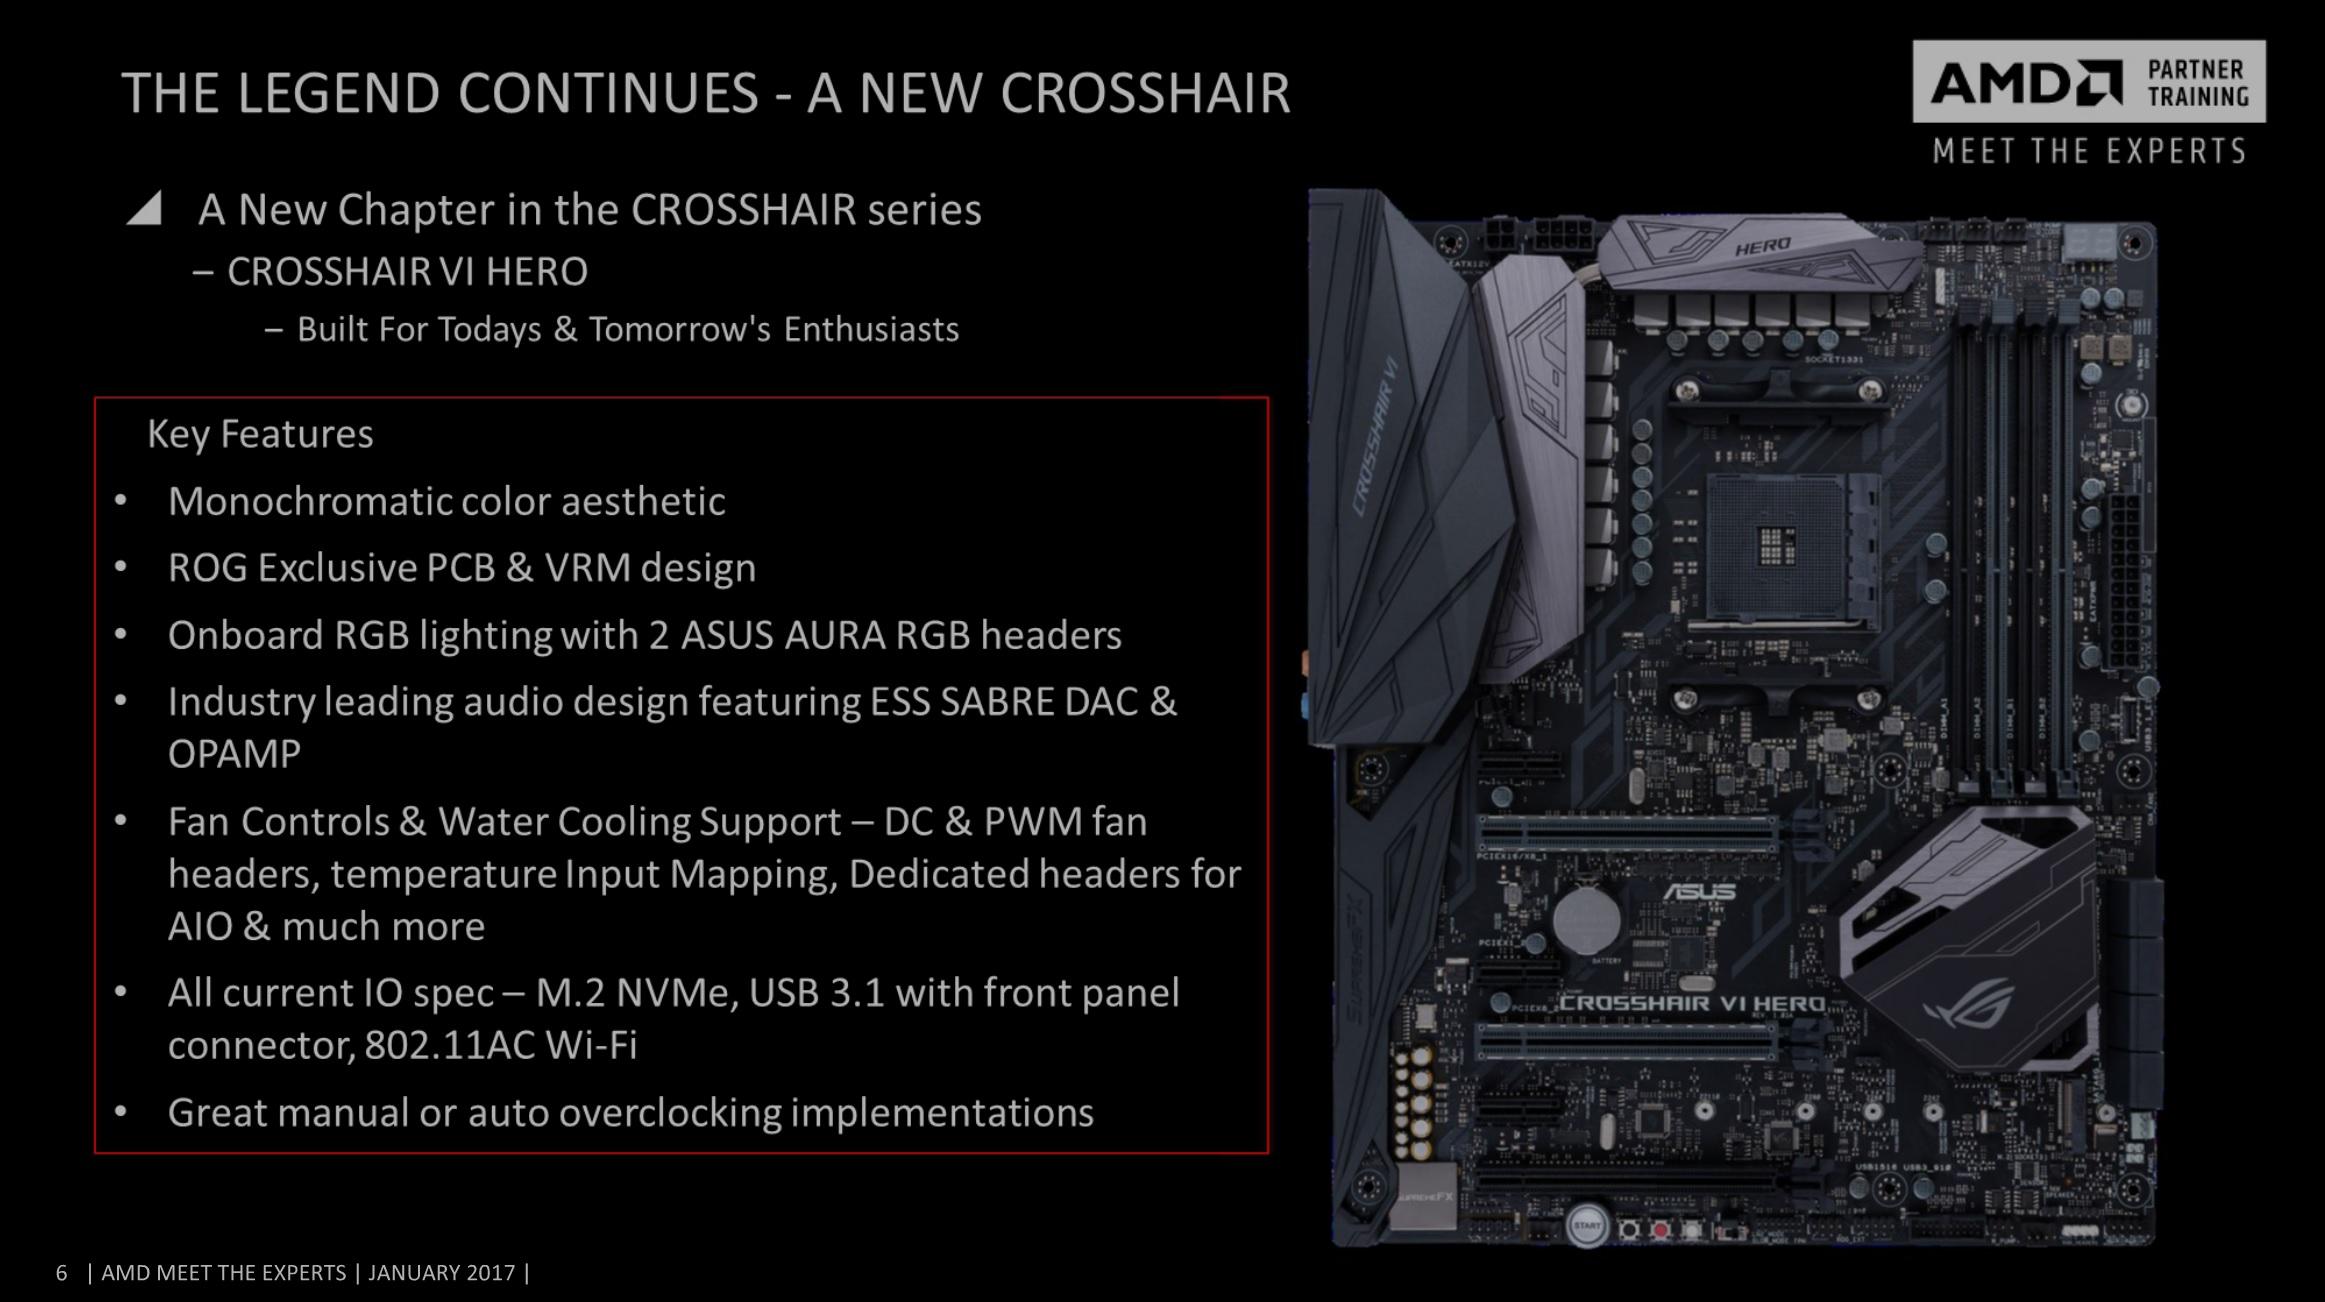 ASUS ROG Crosshair VI Code Ryzen AM4 X370